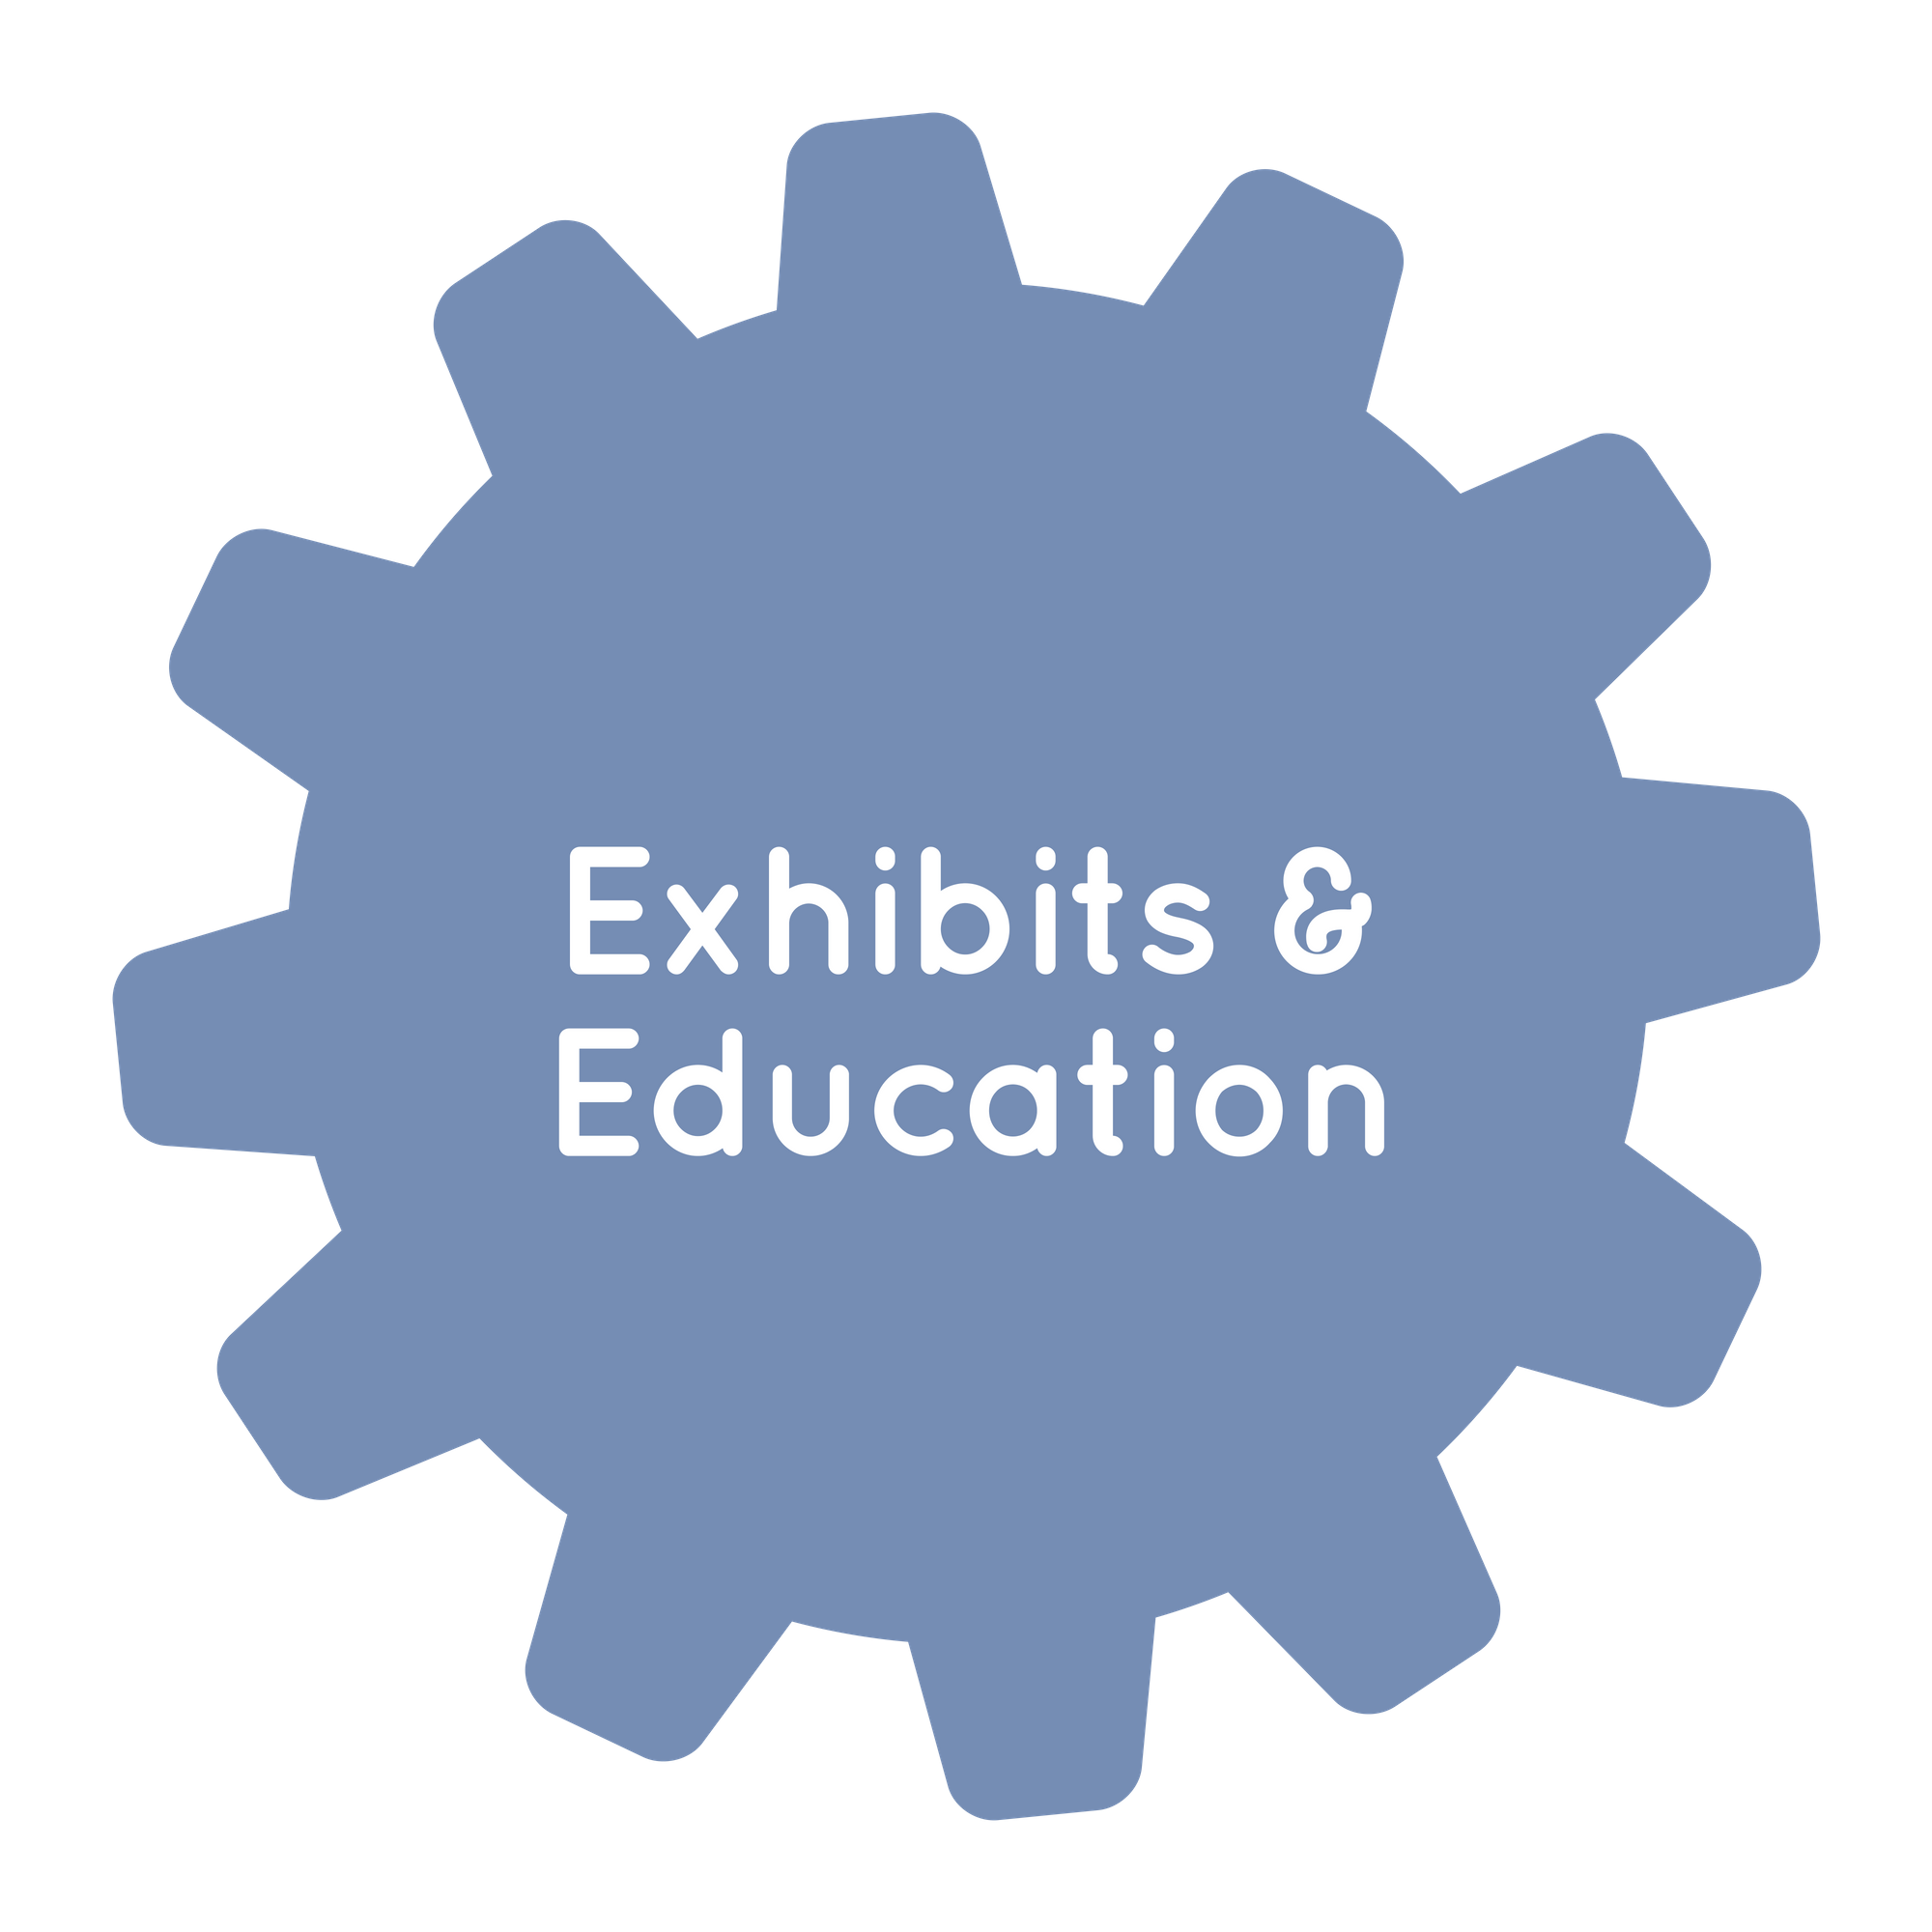 Exhibits/Education office of Children's Museum of Atlanta